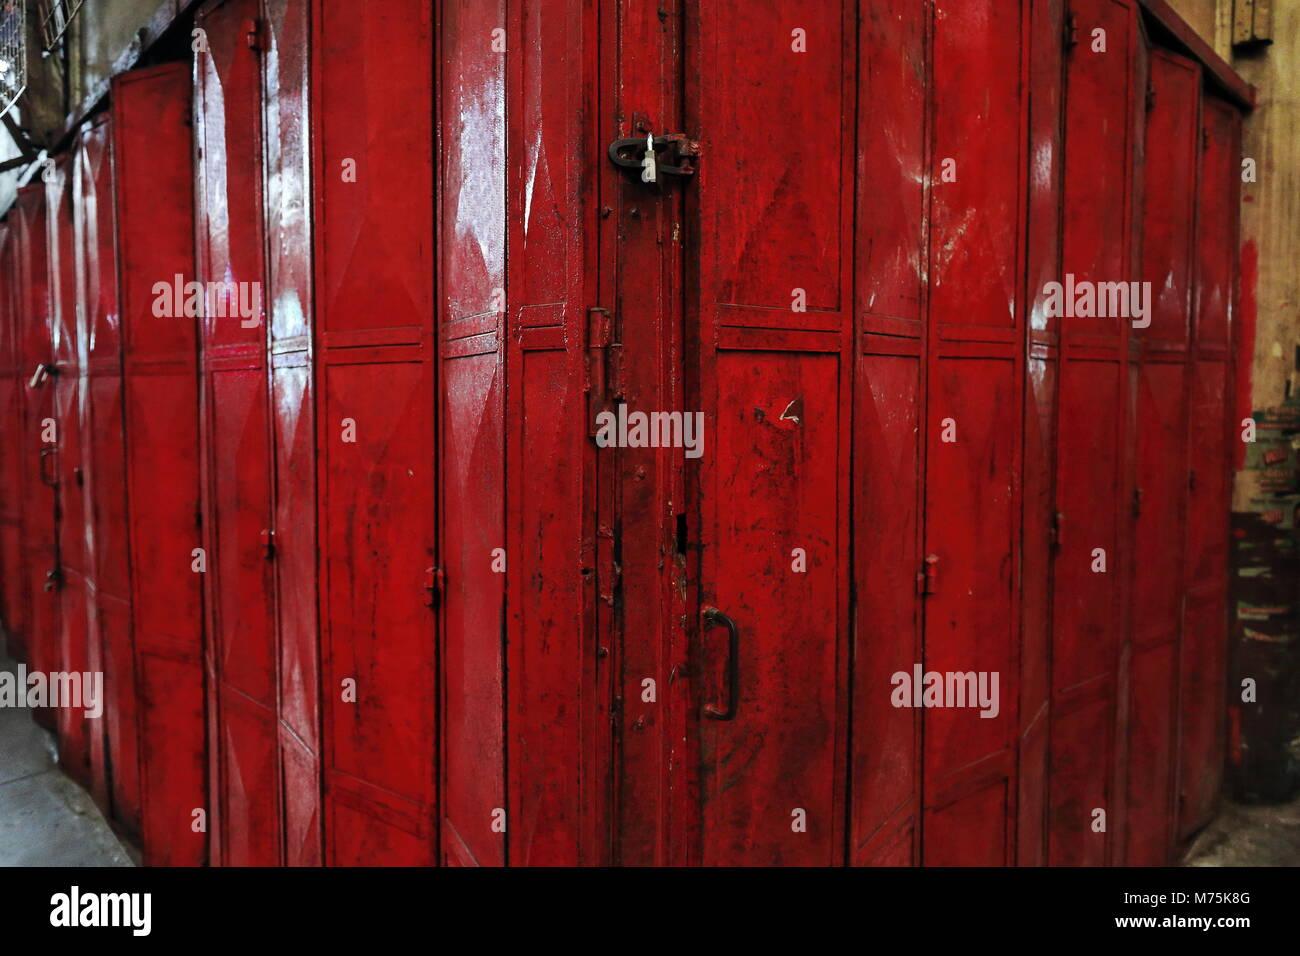 Orange Red Painted Padlock Closed Iron Hinged Folding Door Of A